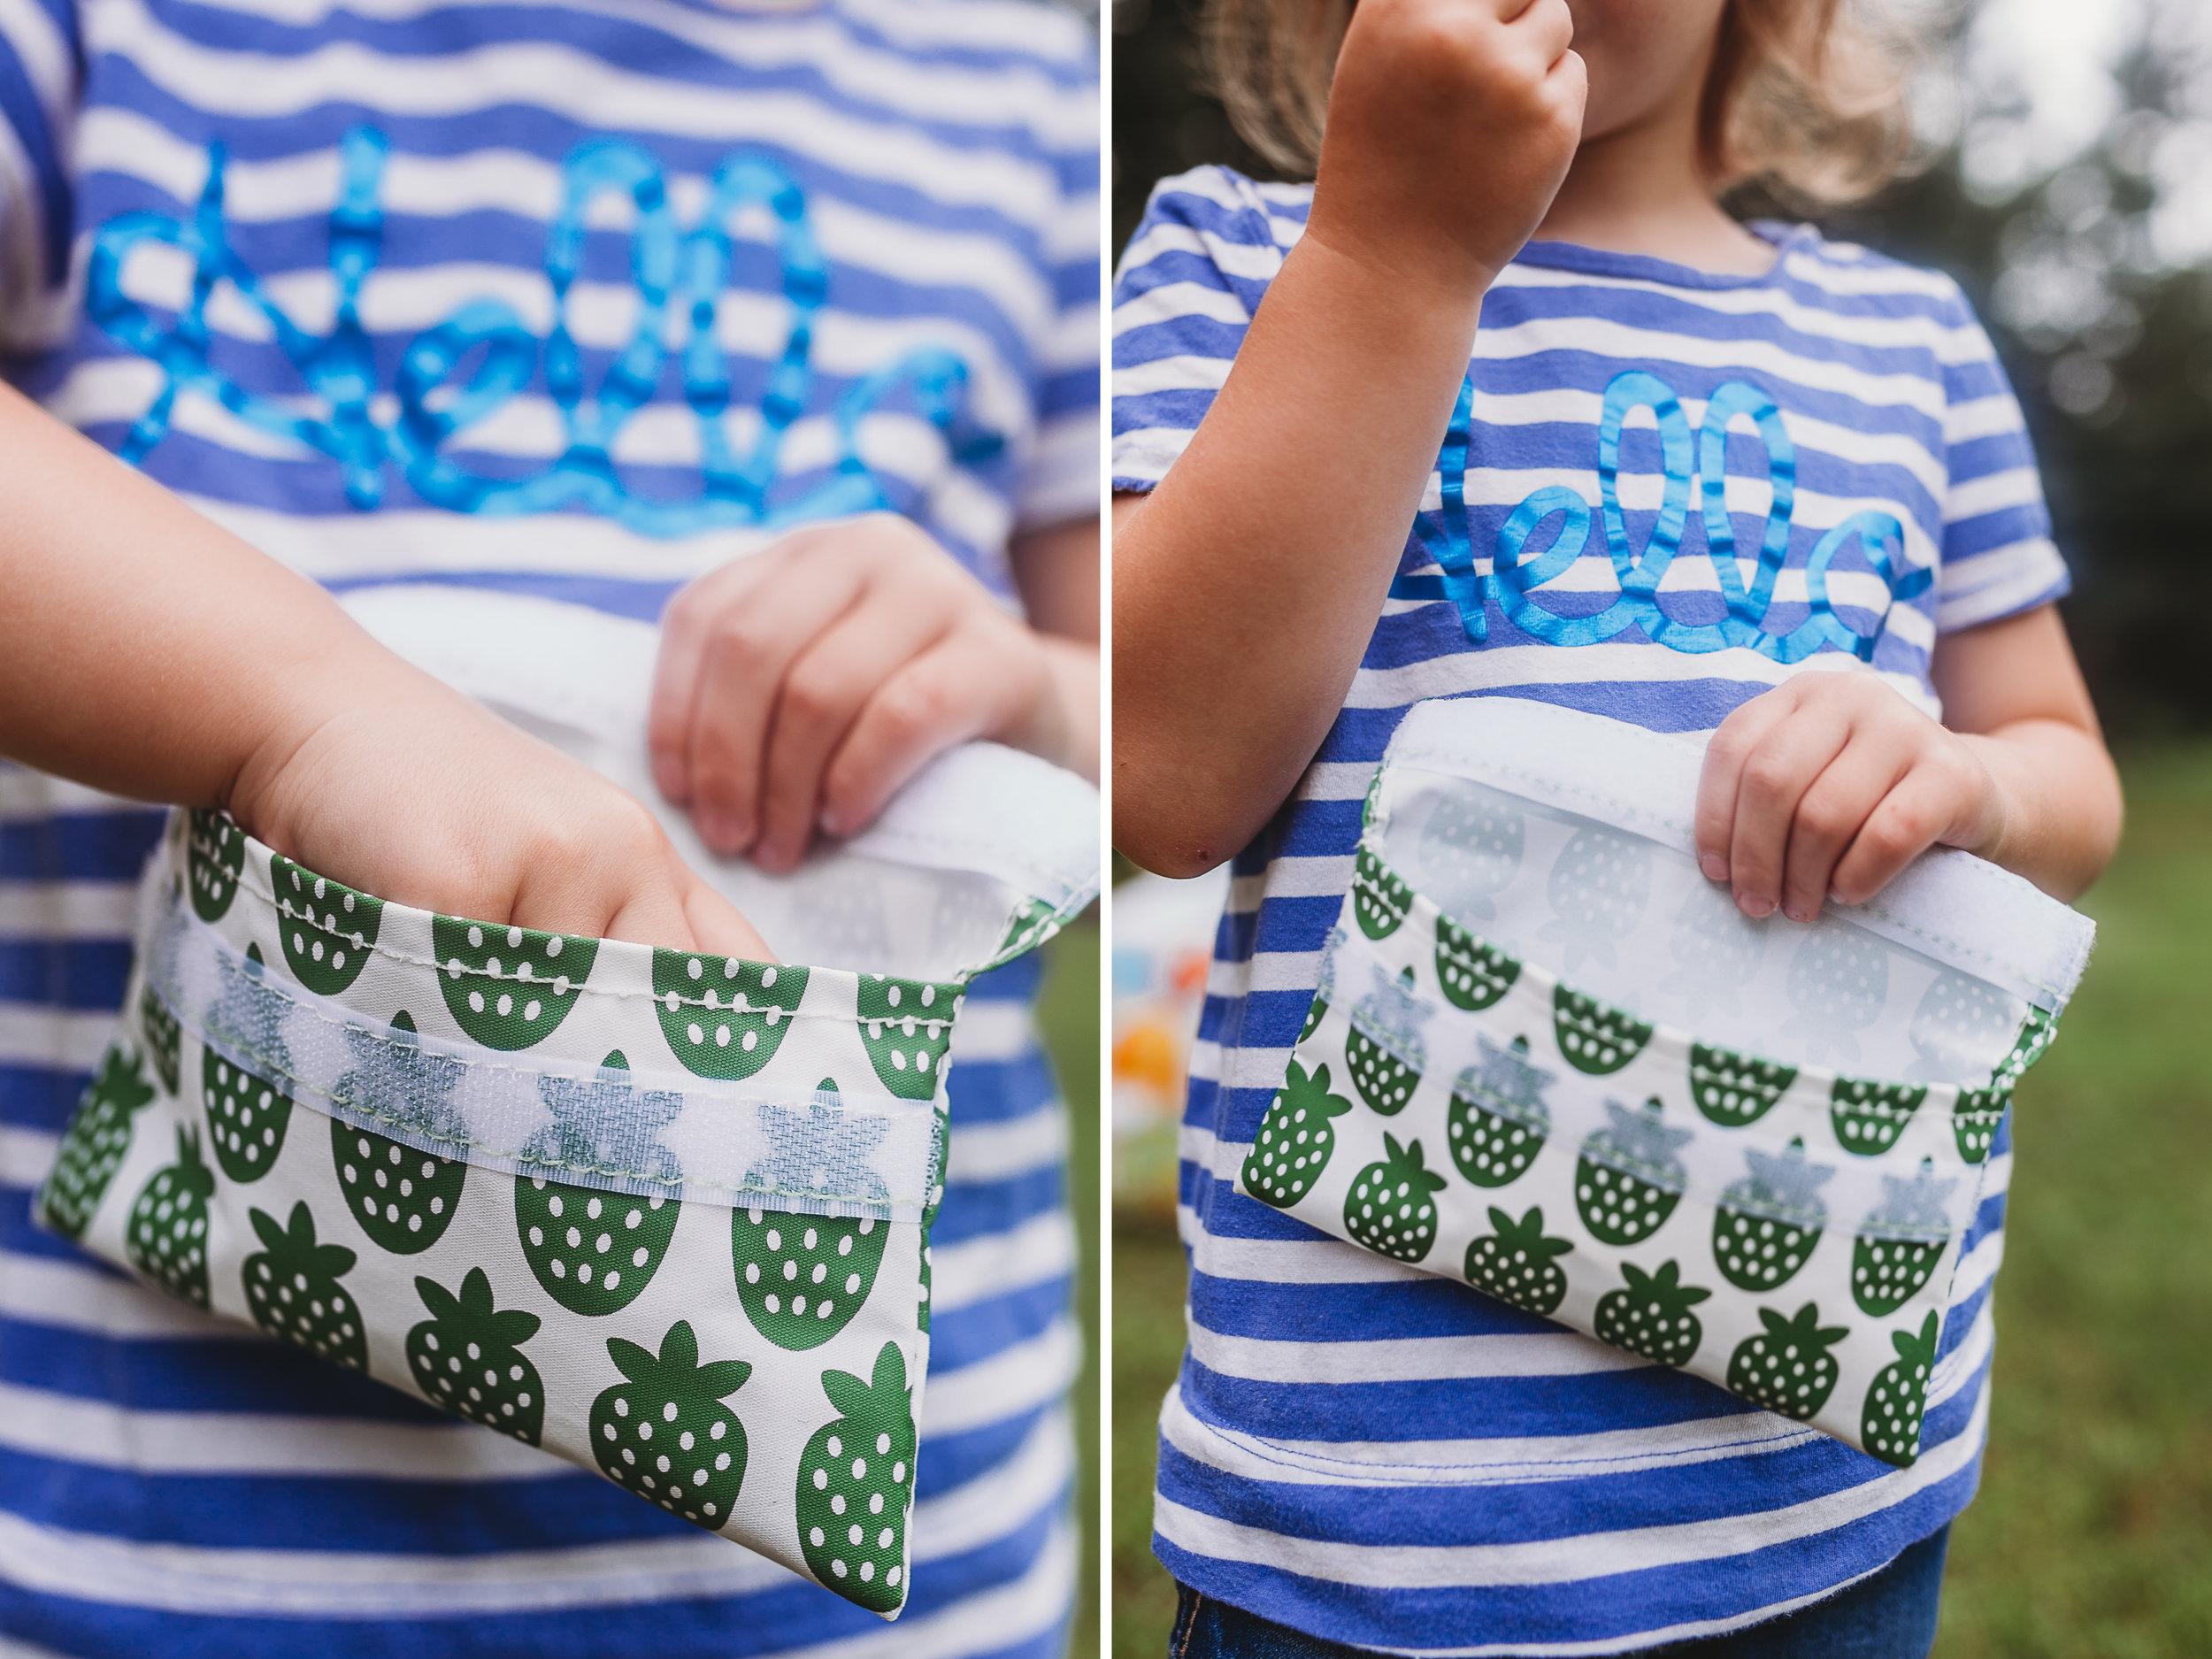 Lunchskins reusable snack bag for kids